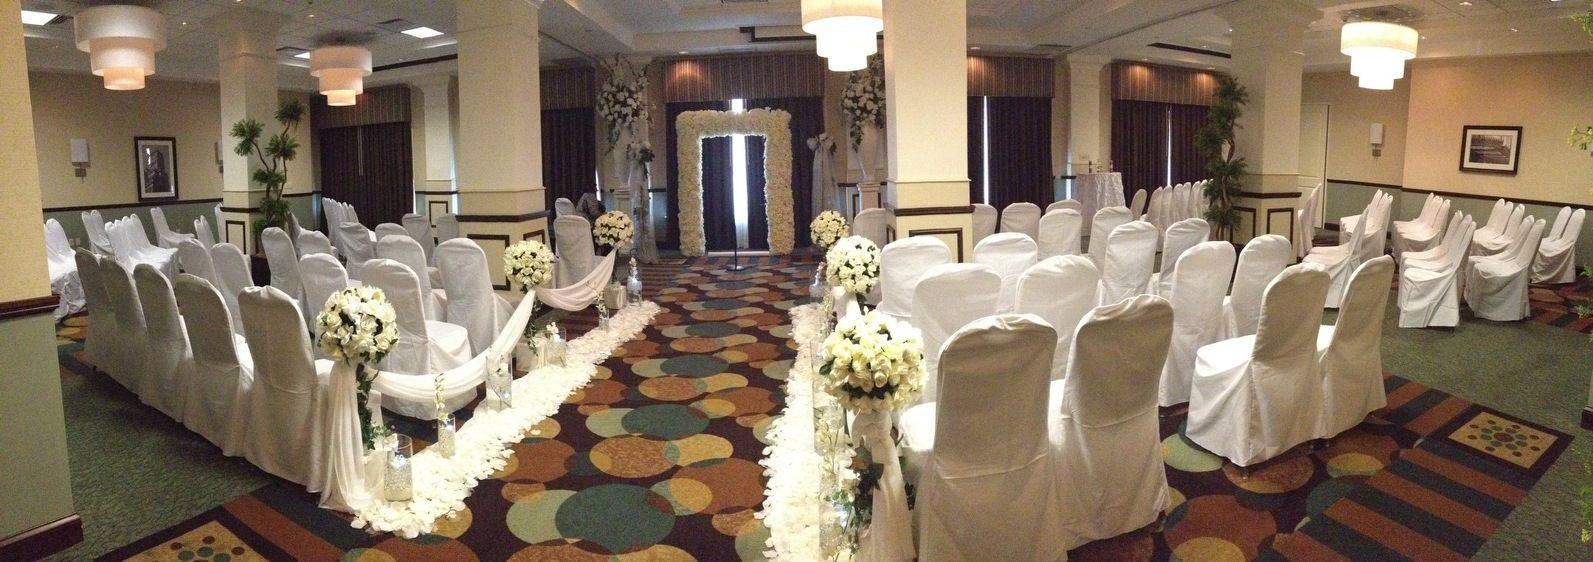 King edward hotel jacksonms weddings parties weddings king edward hotel jacksonms weddings junglespirit Images